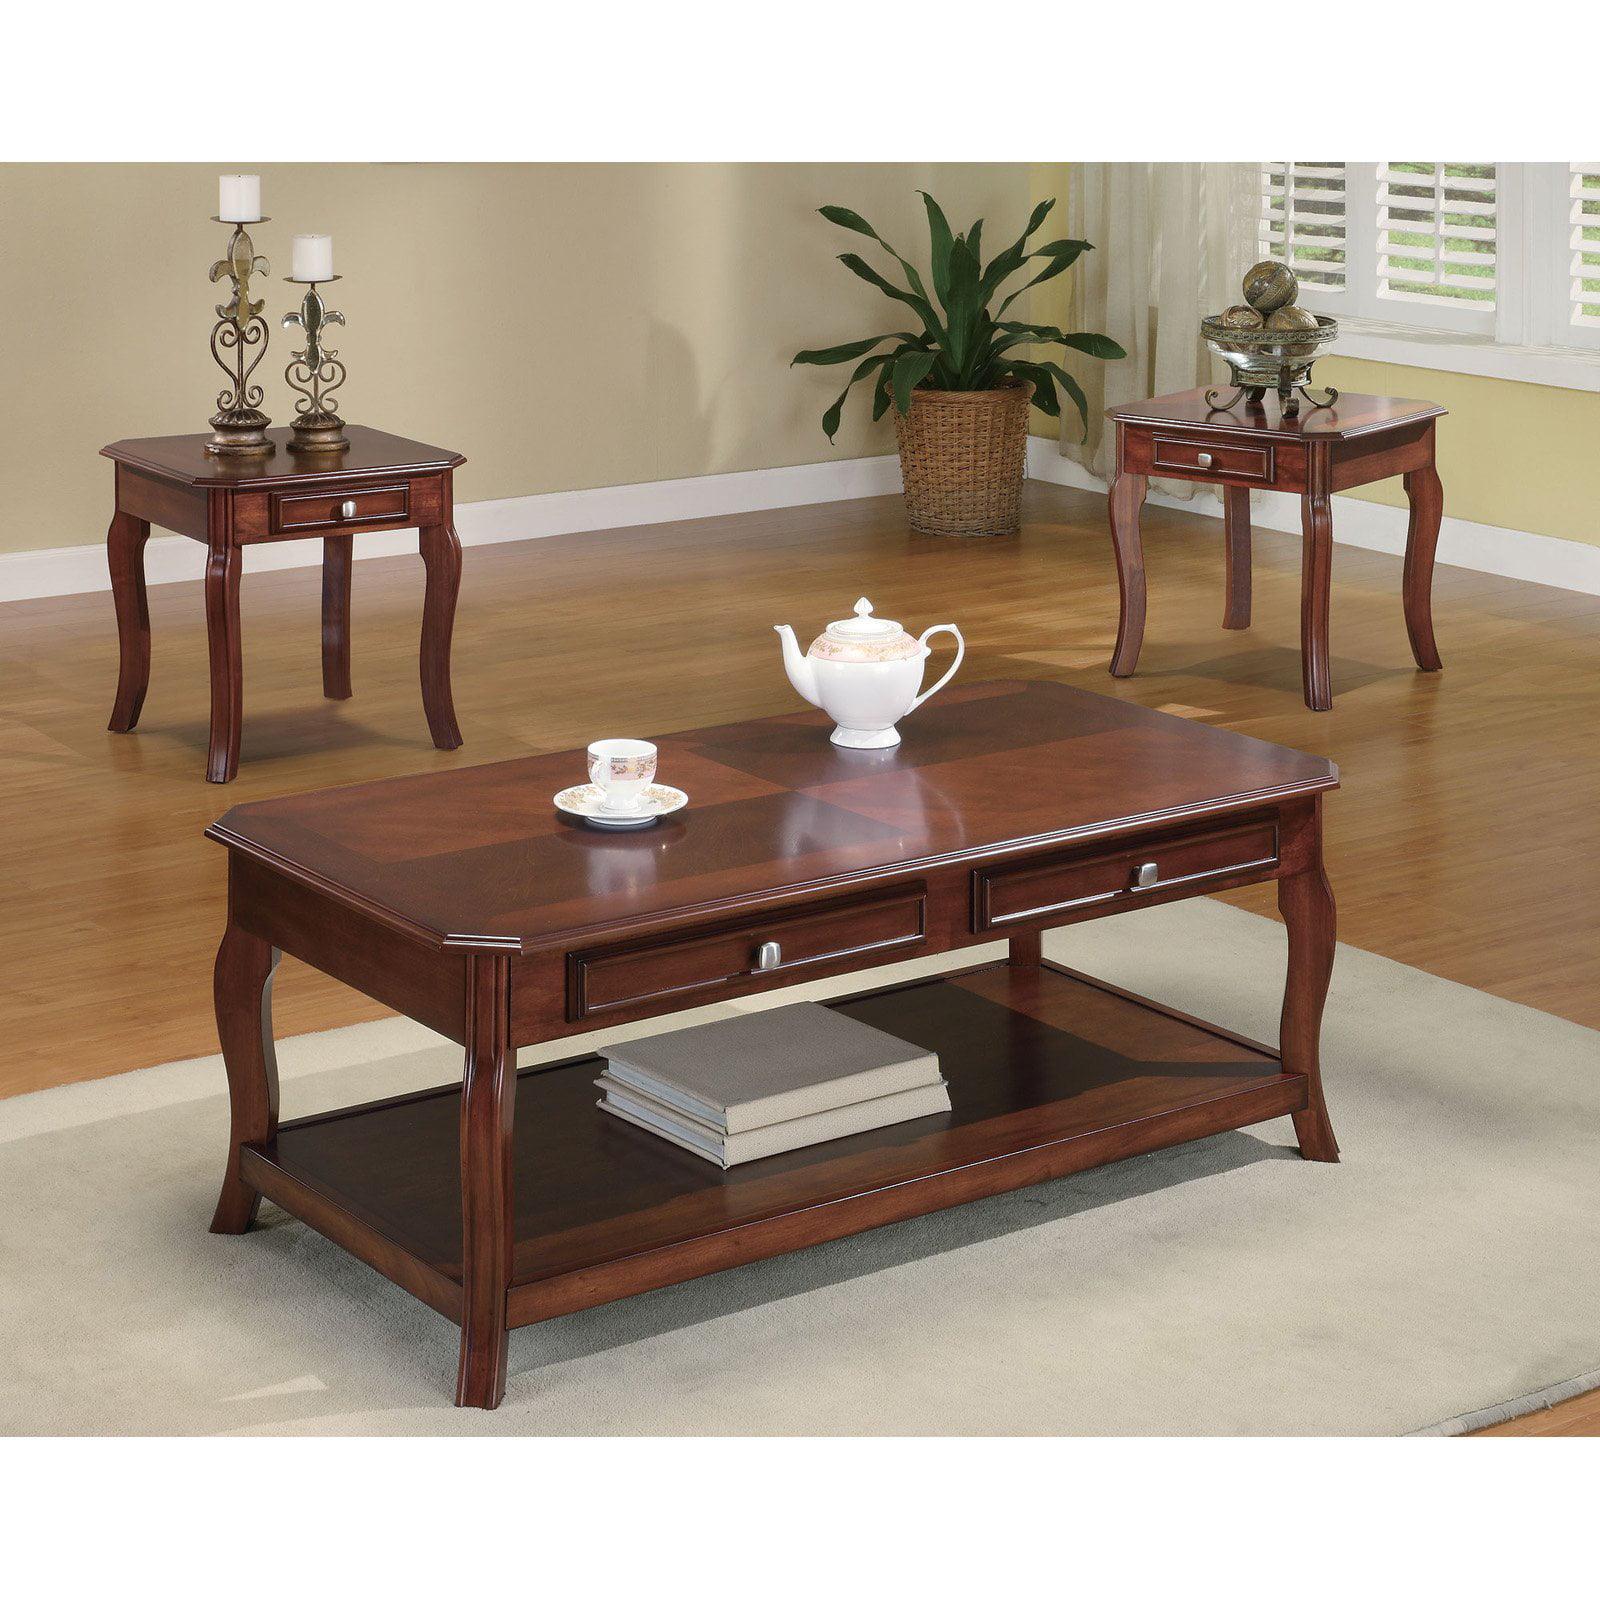 Coaster 3-Piece Table Set, Light Warm Bourbon Finish